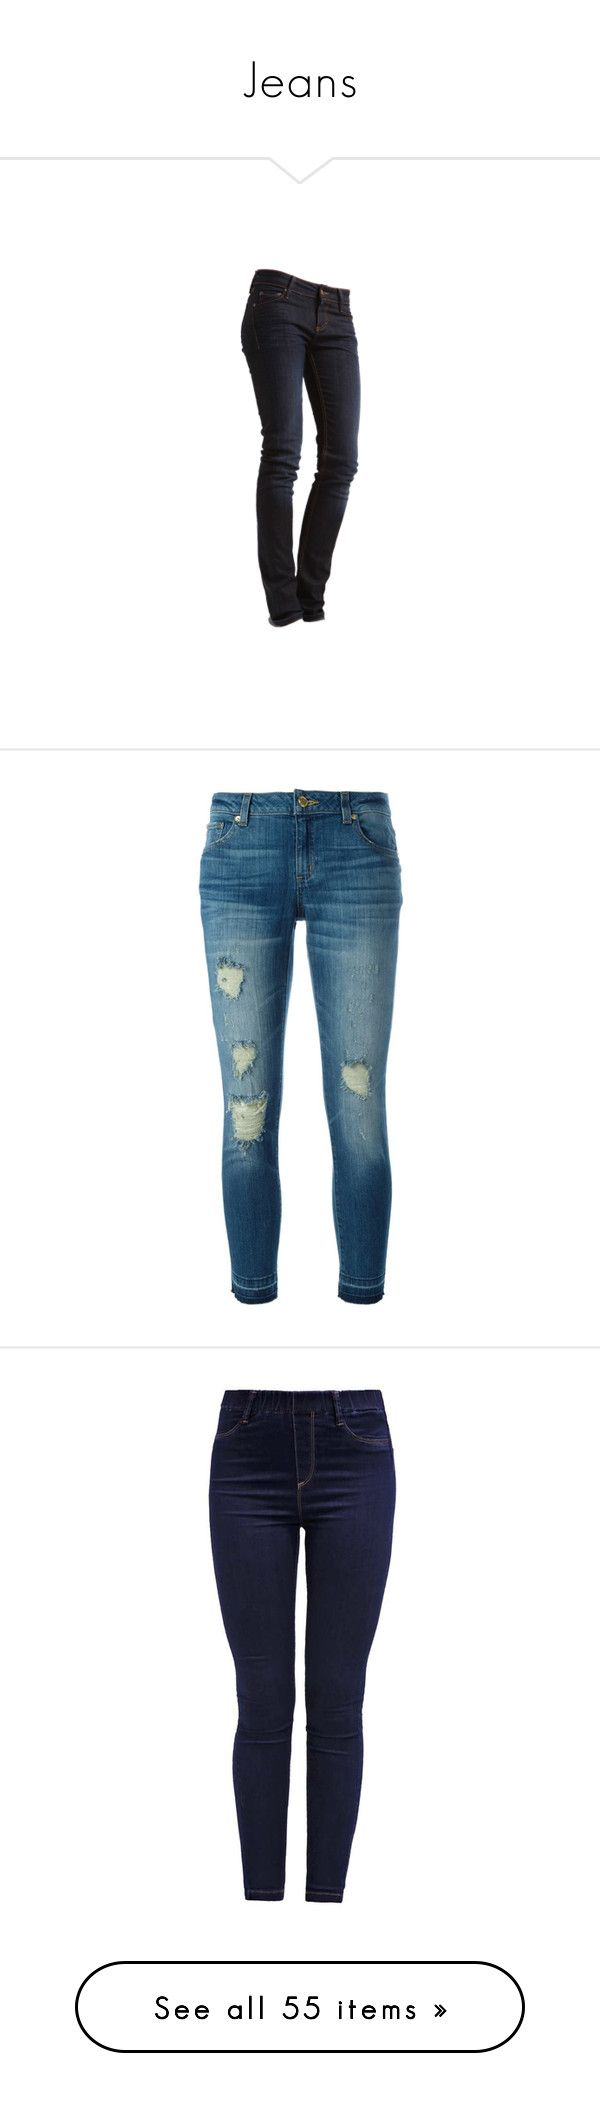 """Jeans"" by alejaborrayo ❤ liked on Polyvore featuring pants, capris, jeans, bottoms, pantalones, blue, zipper trousers, blue capris, helmut lang and cropped capri pants"